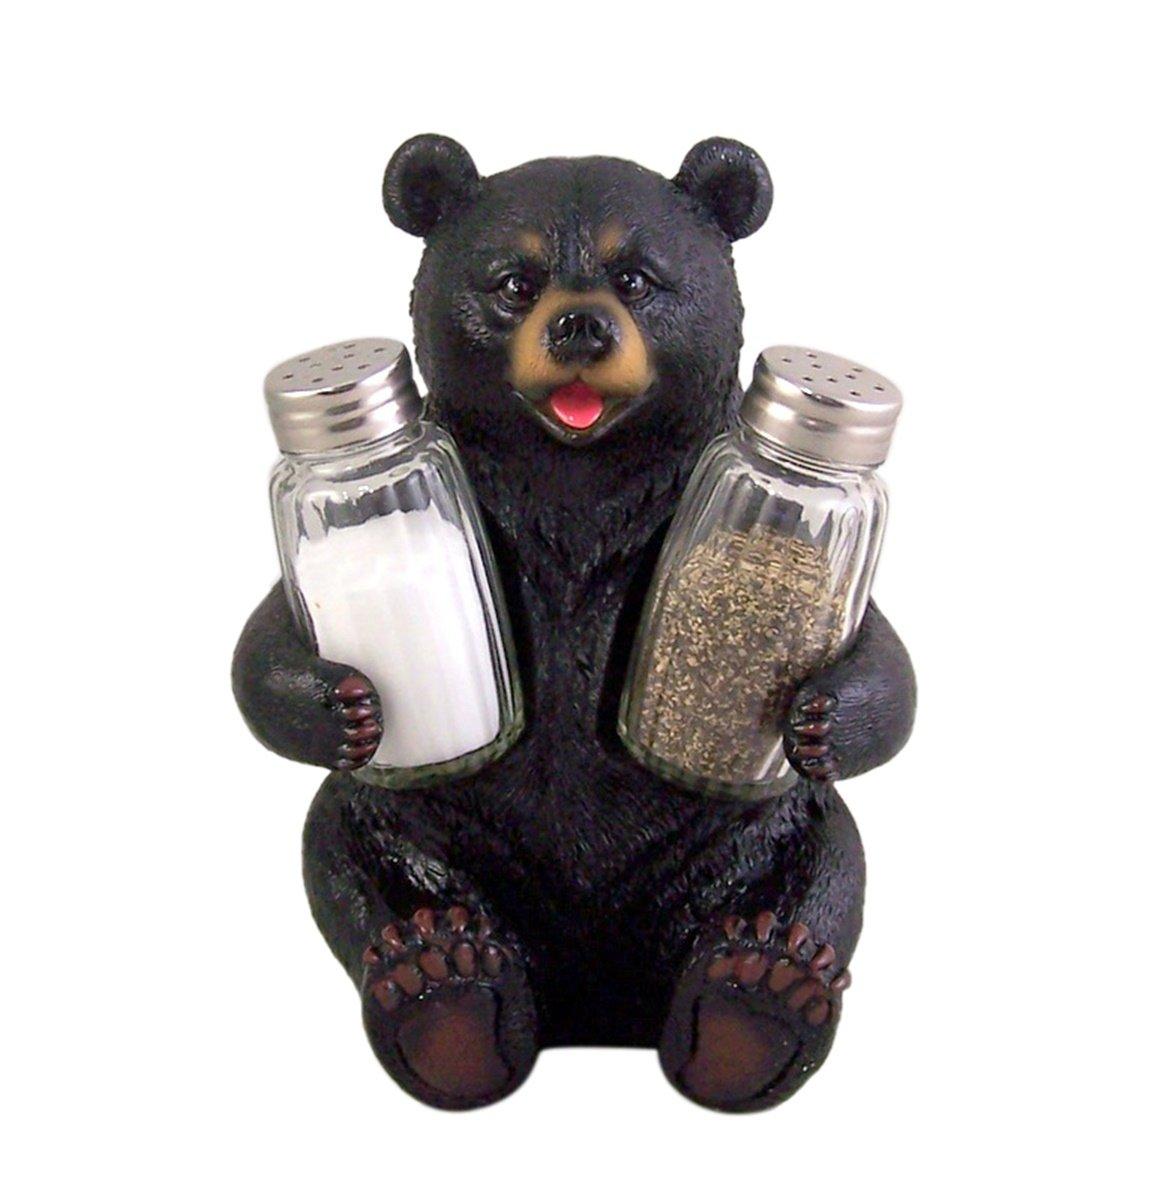 Season Beary Carefully Black Bear Salt and Pepper Shaker Holder 7 Inch (Shakers Included) DWK Corporation